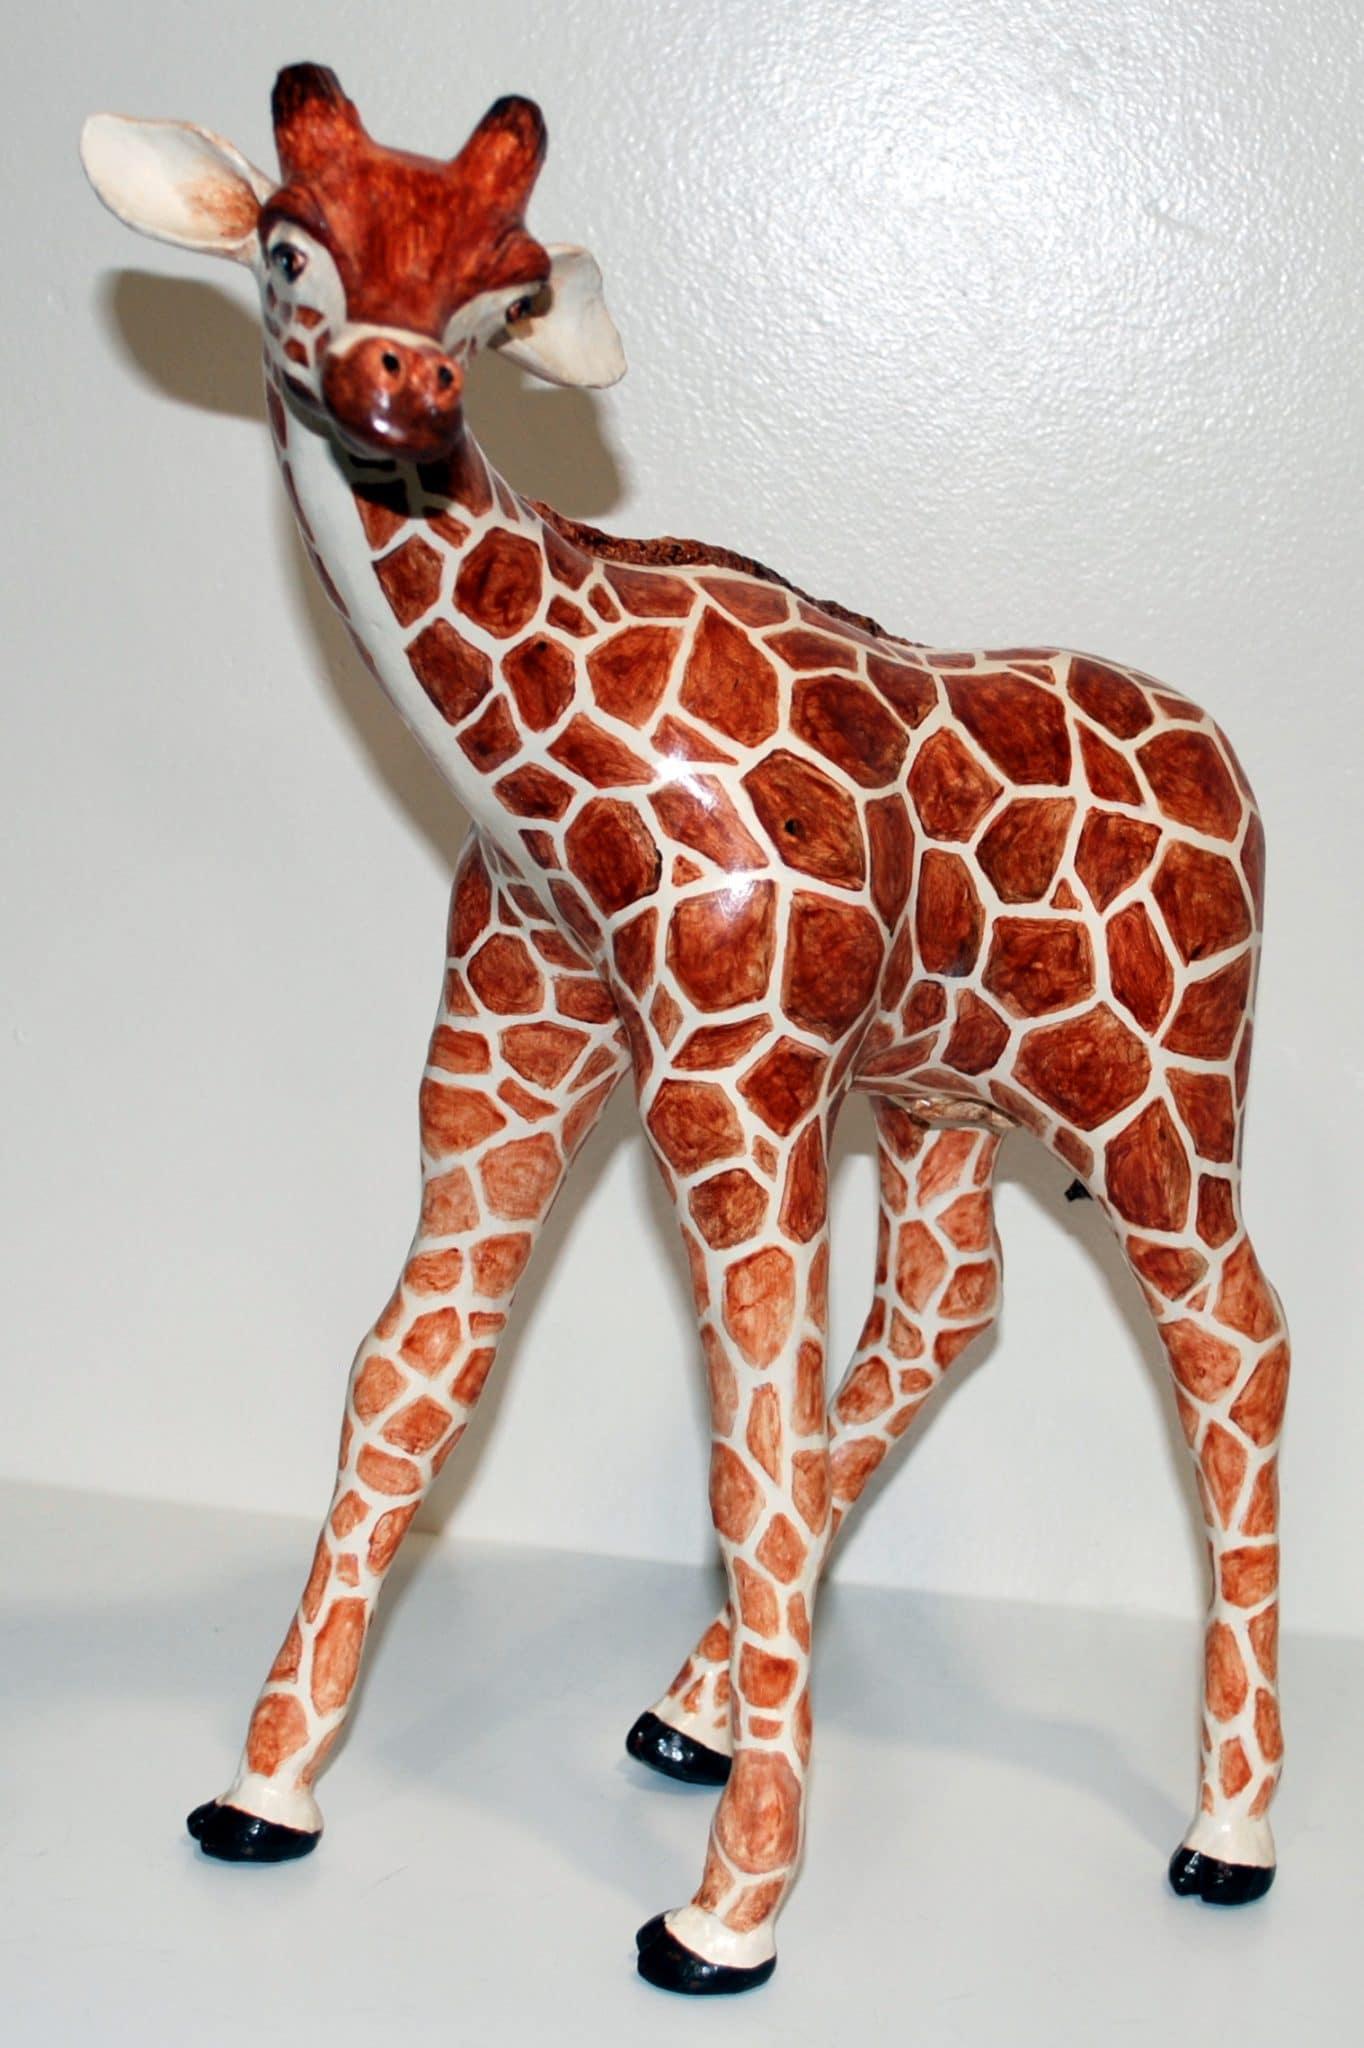 (My) Giraffe